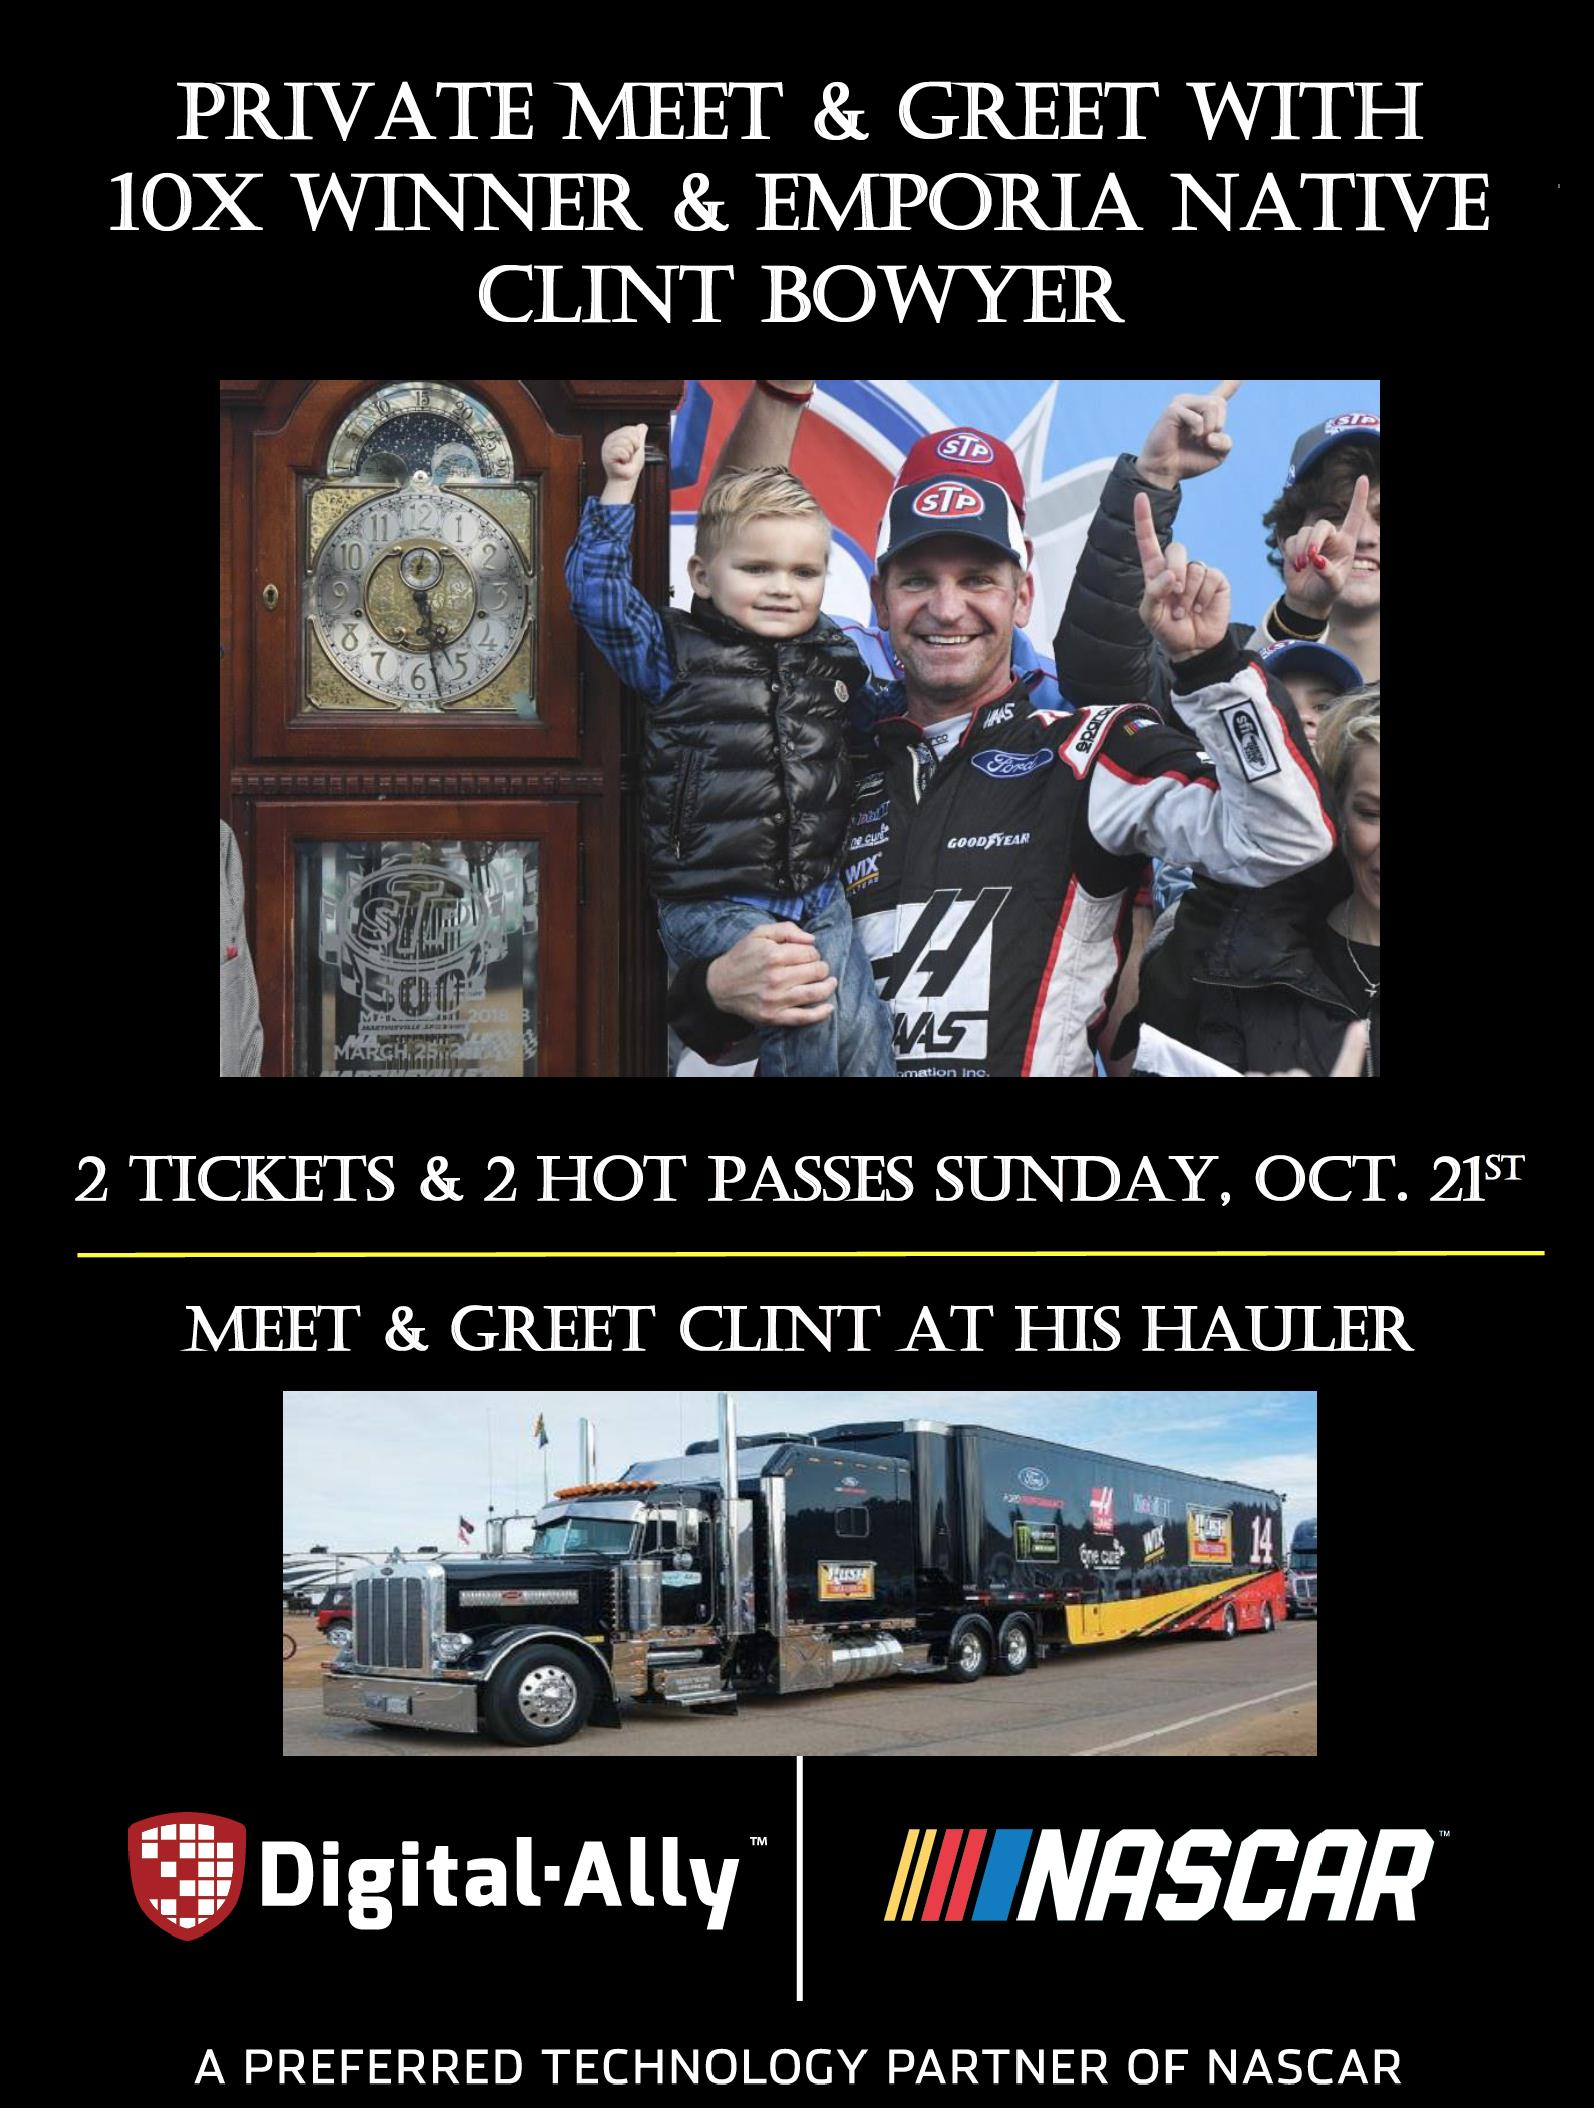 Clint Bowyer